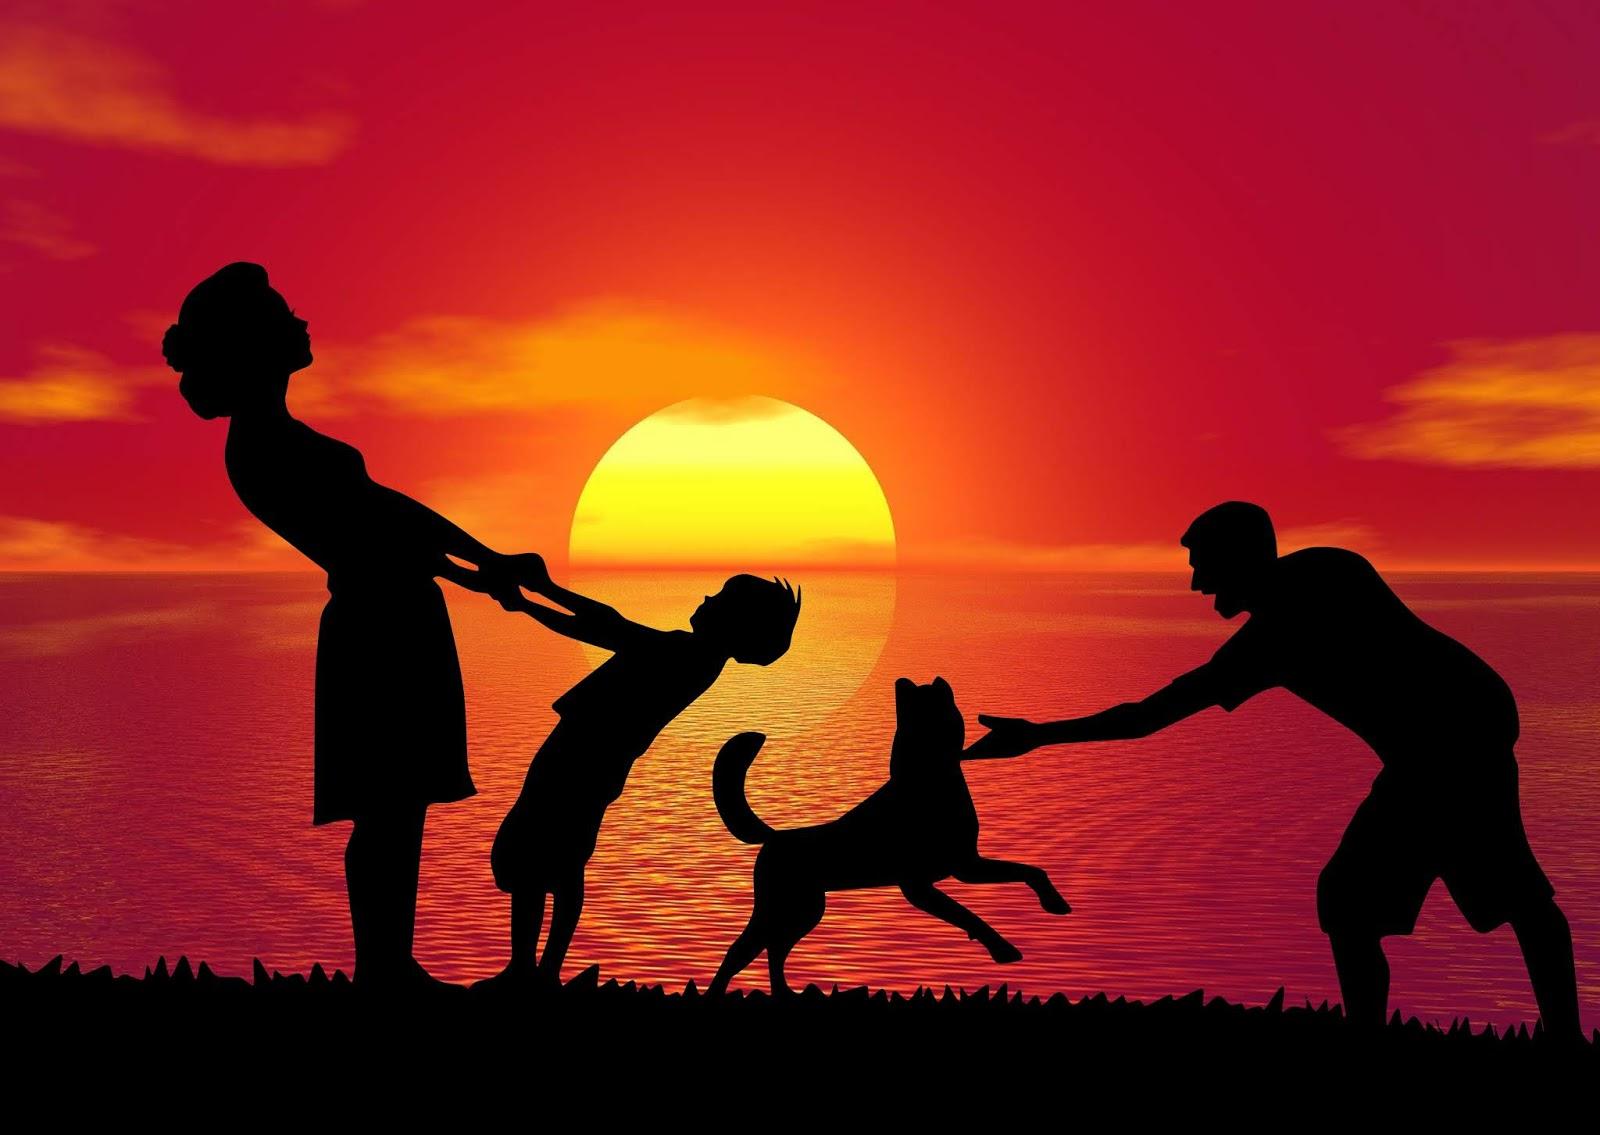 Family having fun outdoor Silhouette design